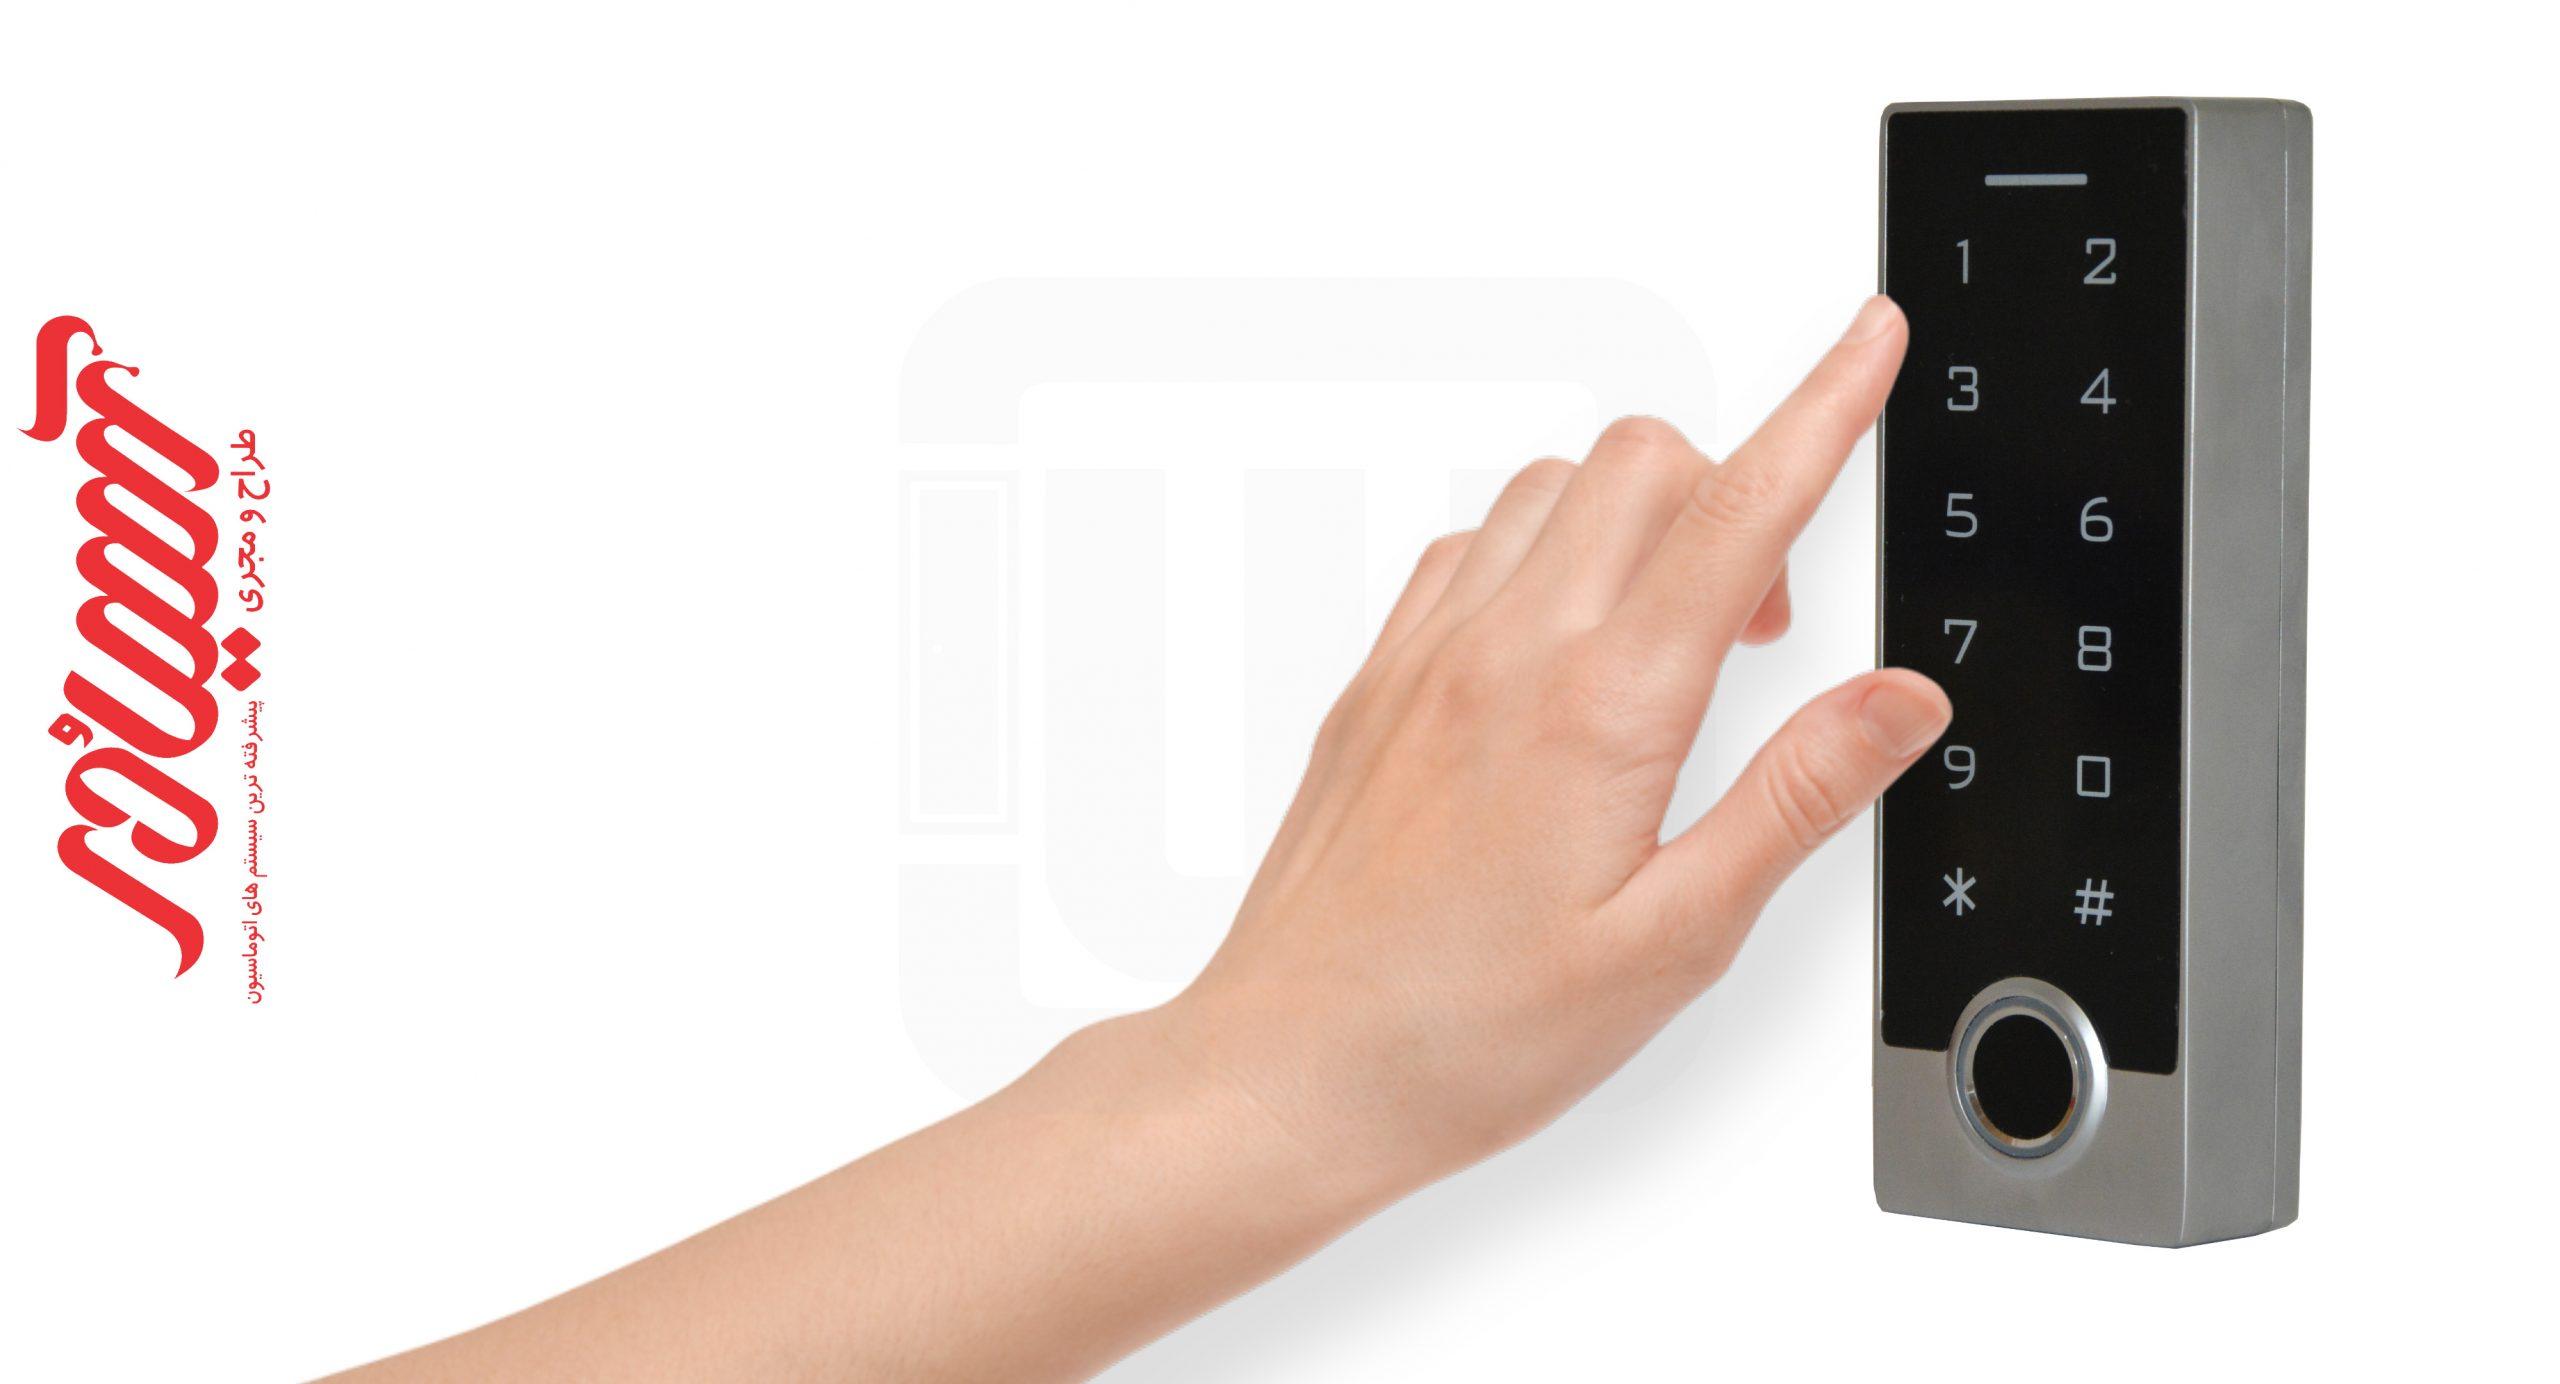 دستگاه کنترل تردد اچ ام تی اثرانگشتی HMT FK13